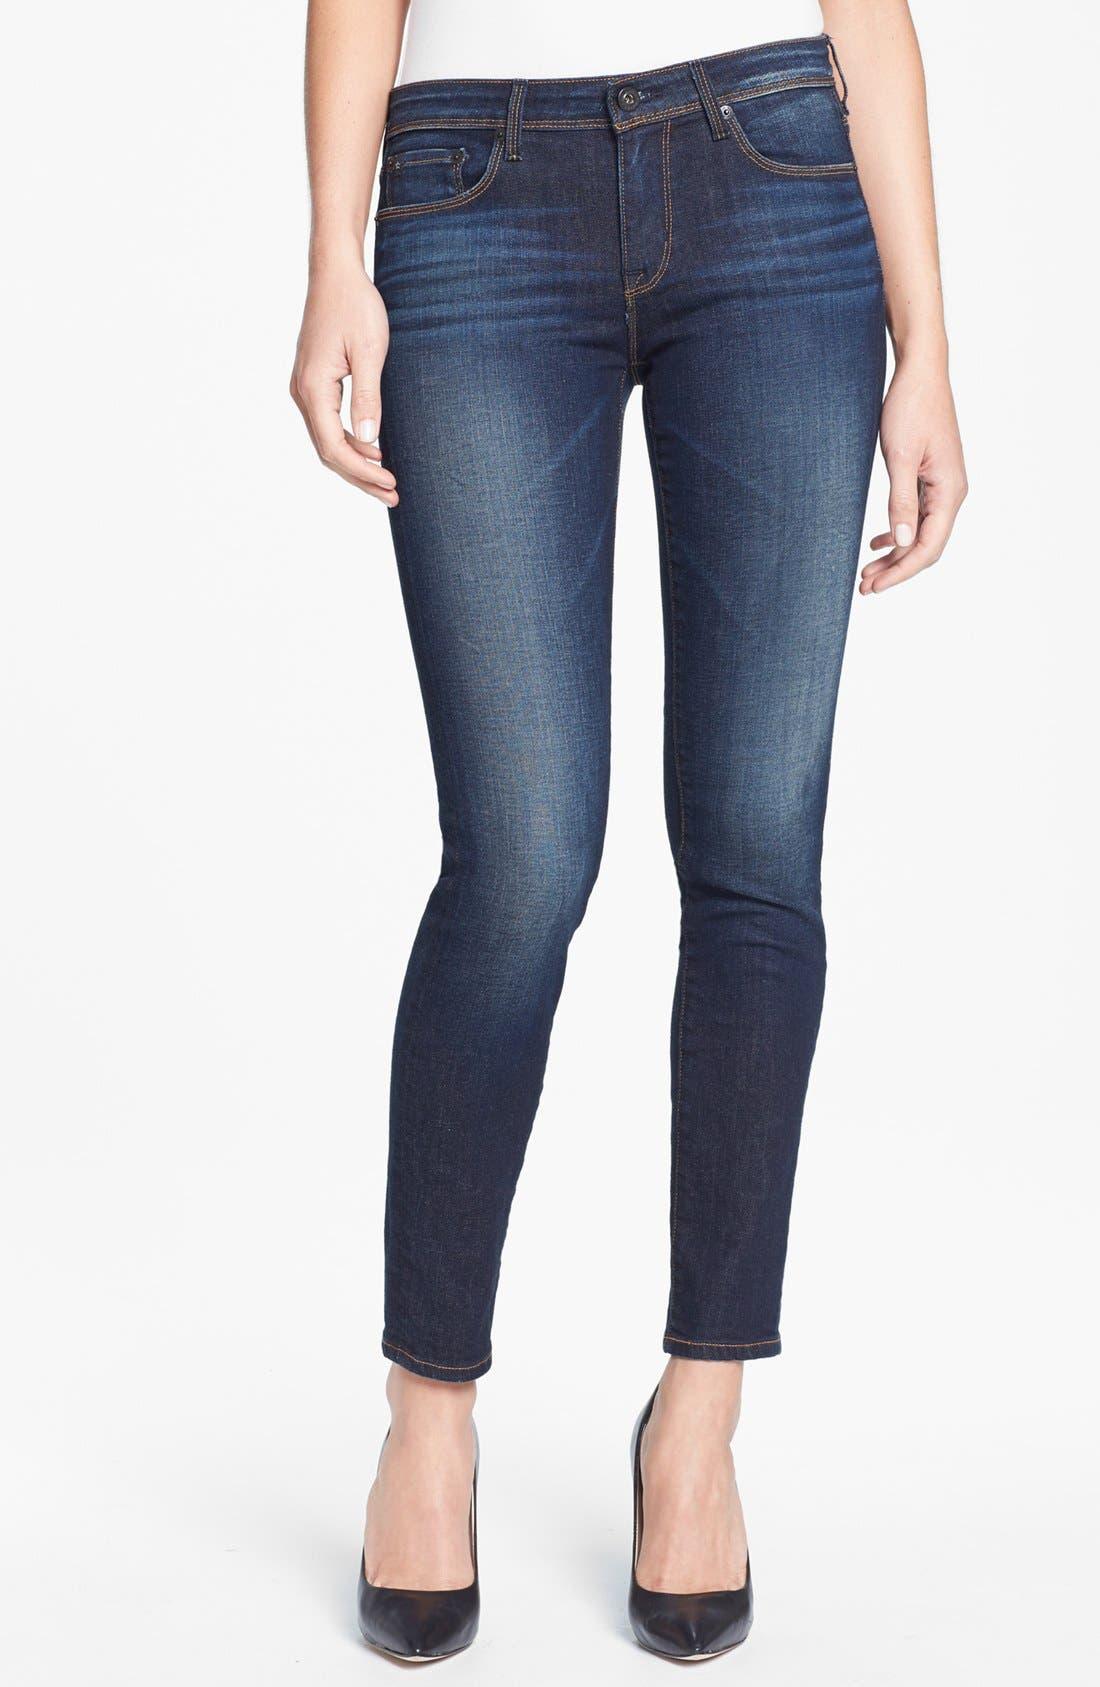 Main Image - Big Star 'Alex' Stretch Skinny Jeans (Valencia) (Petite)